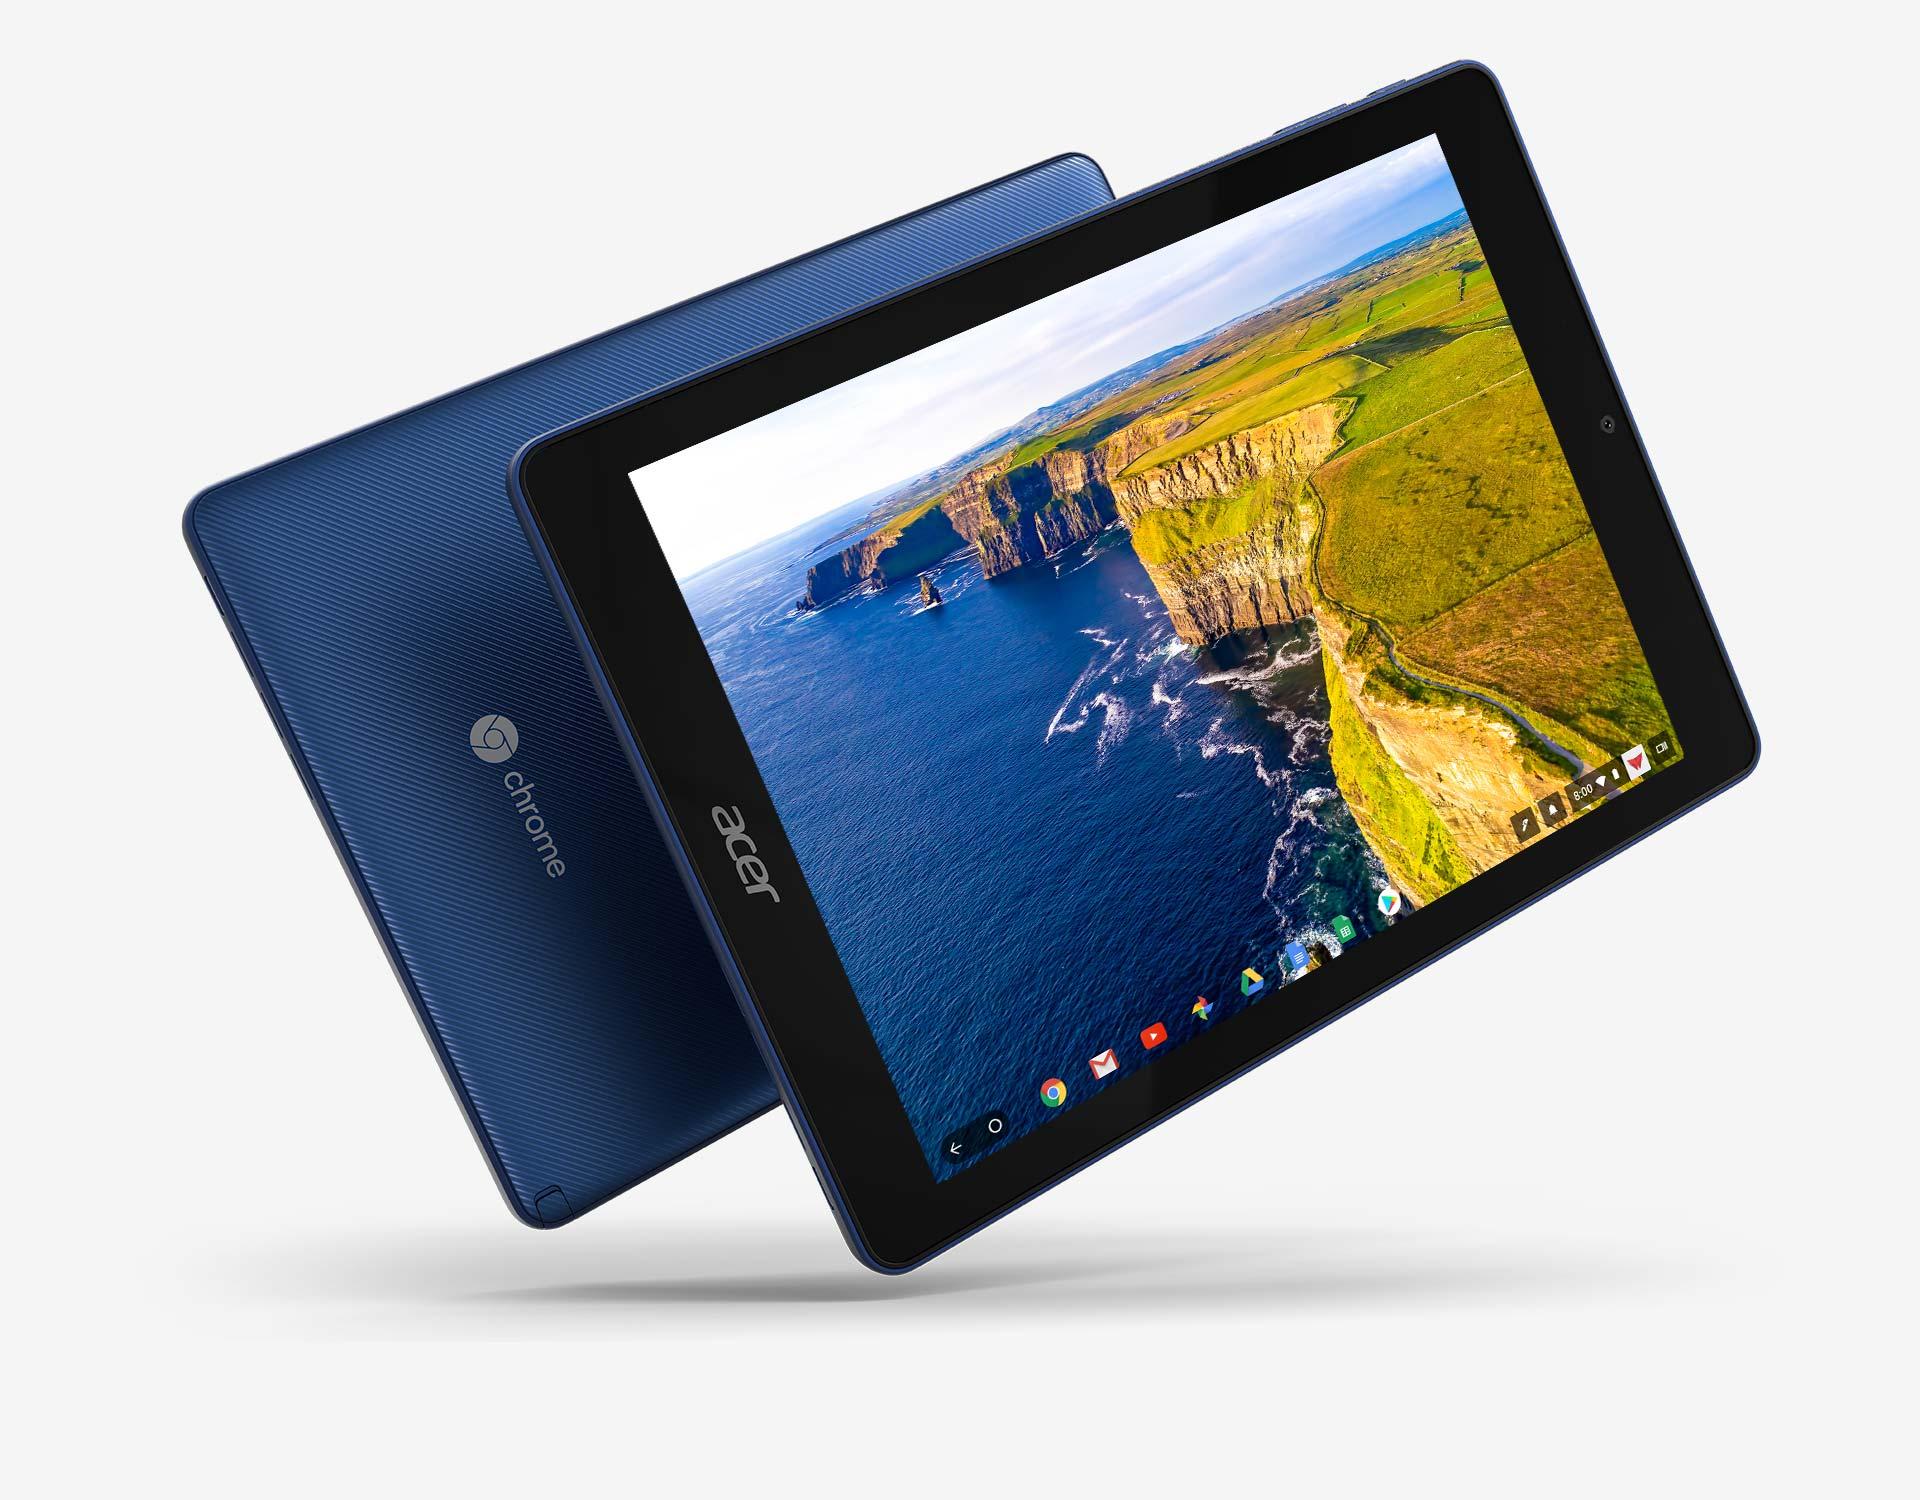 EDU - ACER Chrome Tab 10 - 4GB, eMMC, SD card reader, 9.7